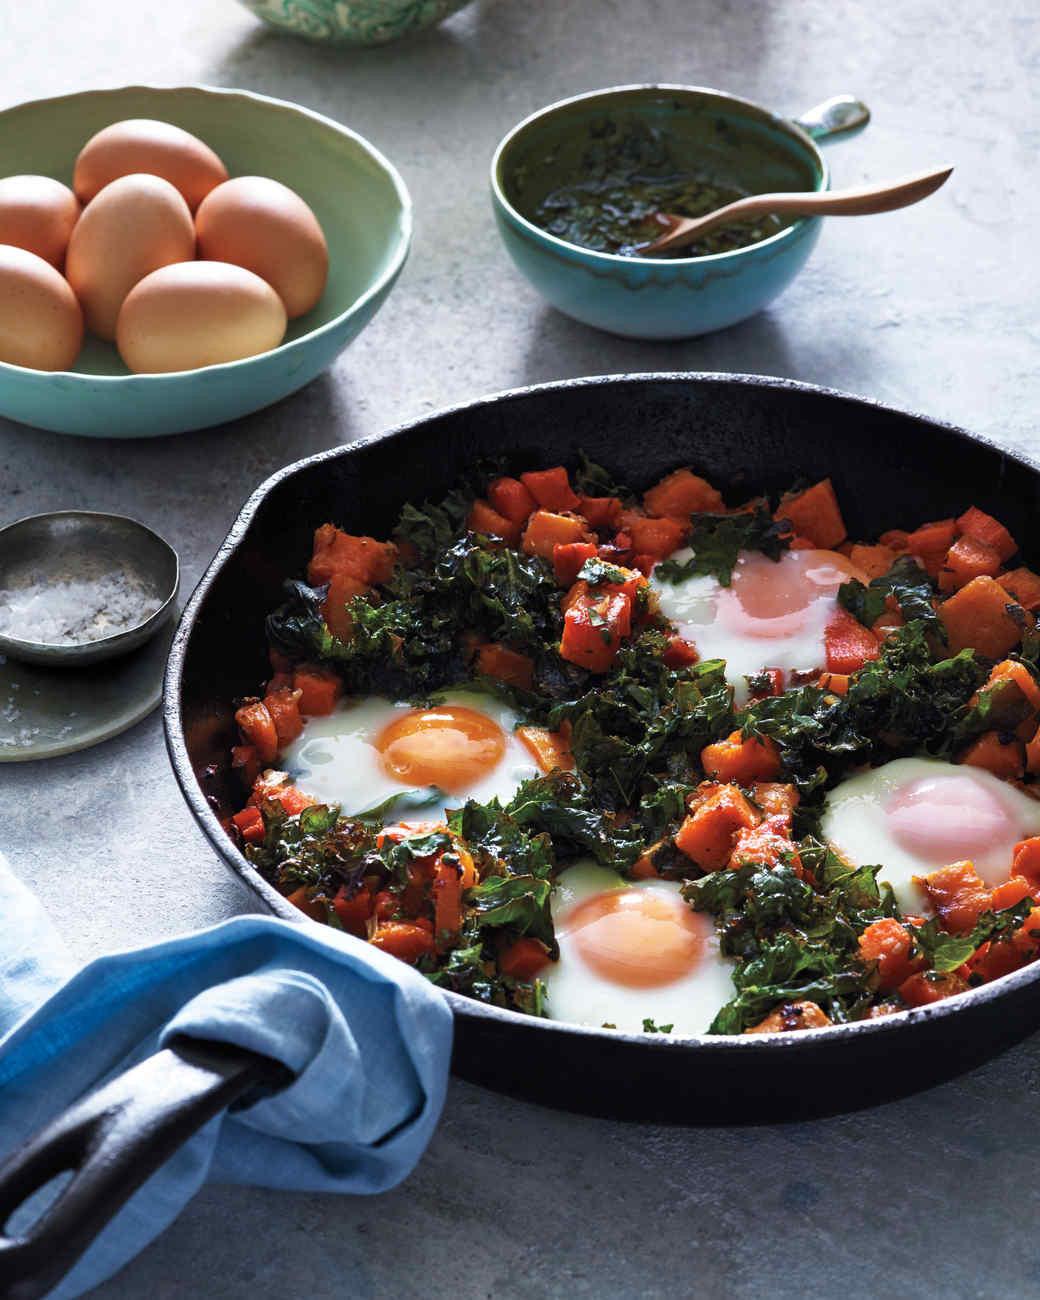 Low Carb Vegetarian Dinner  Luscious Low Carb Ve arian Recipes